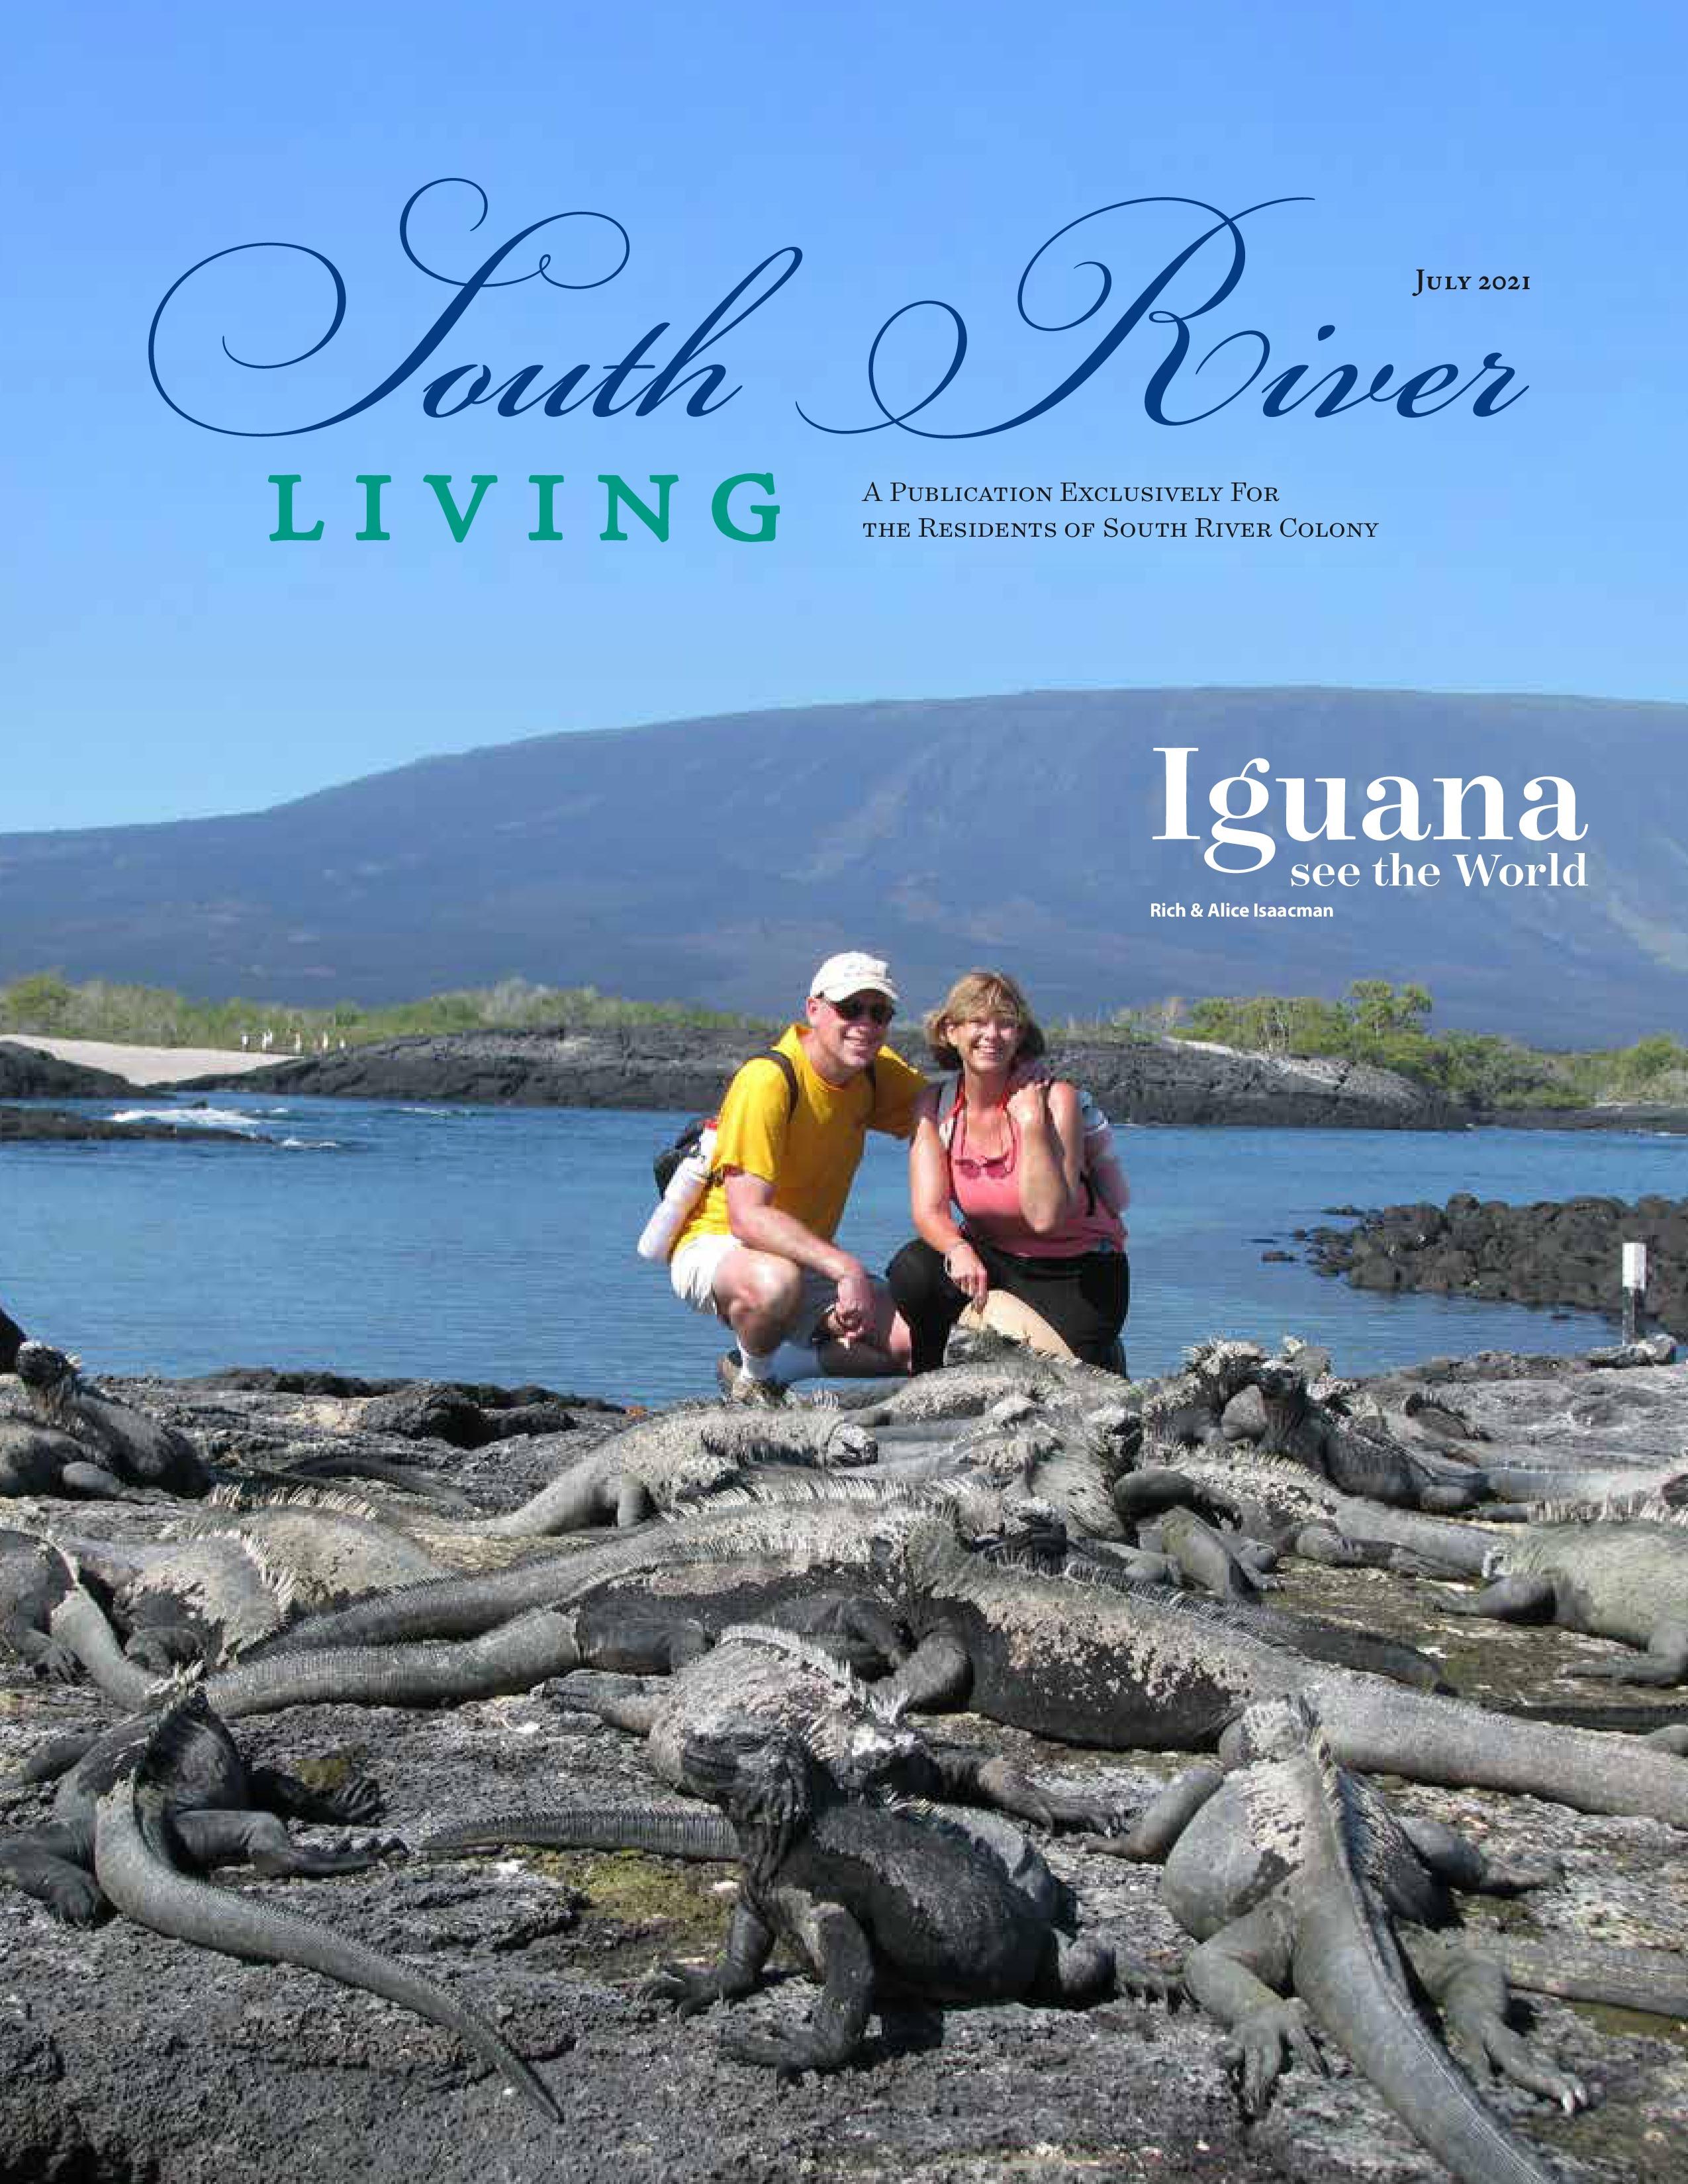 South River Living 2021-07-01